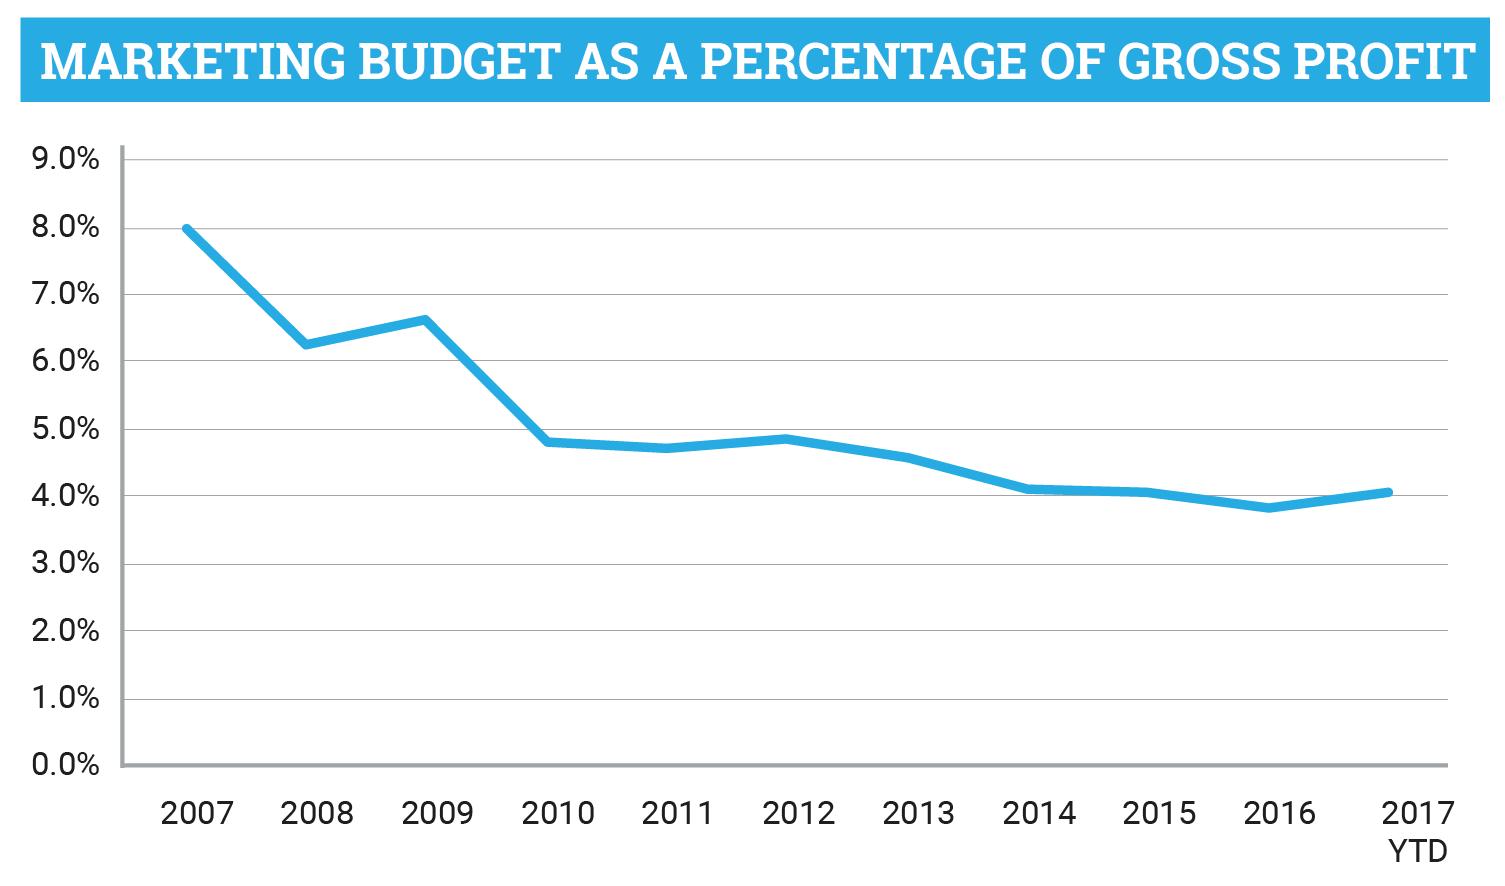 Recruitment Marketing Budget as a Percentage of Gross Profit